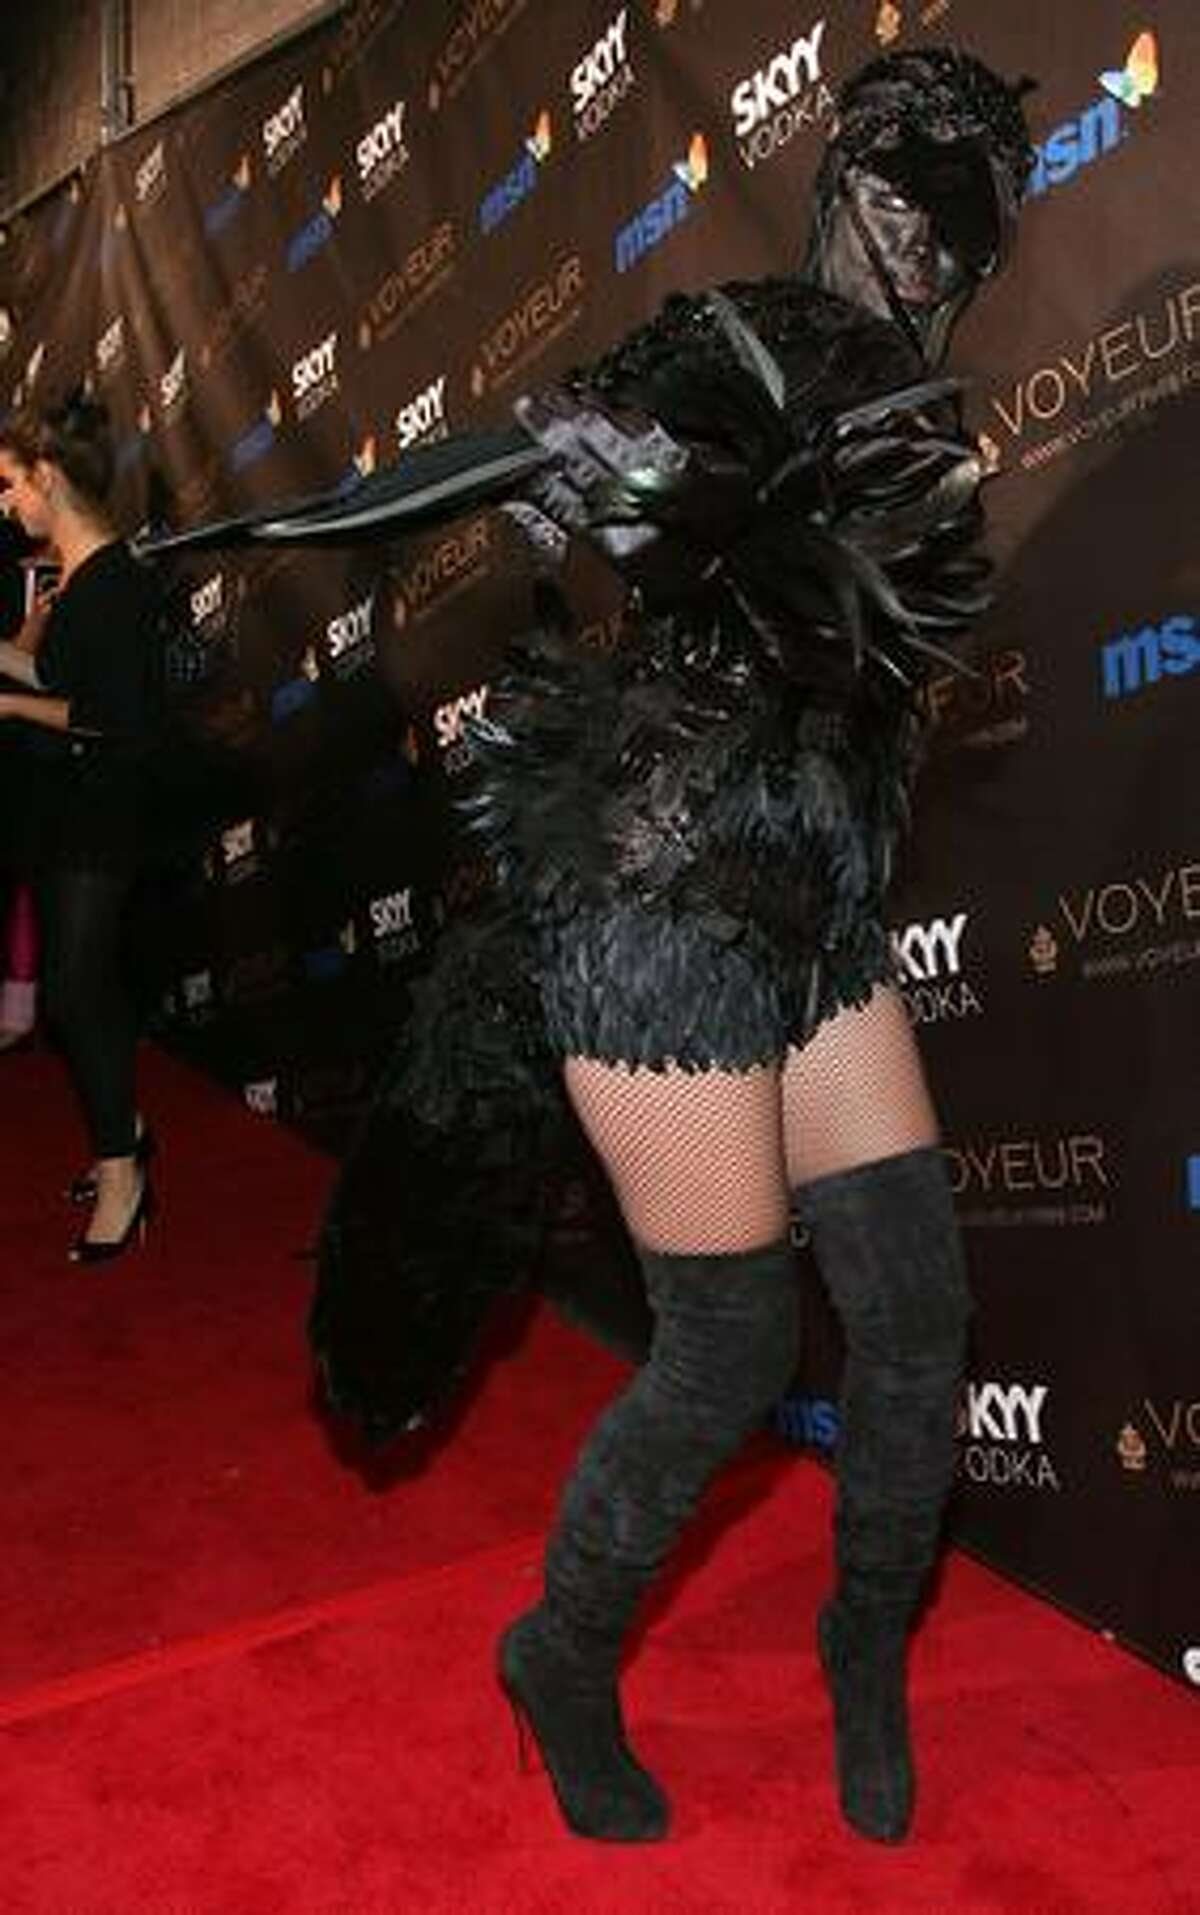 Heidi Klum arrives at the Heidi Klum's 10th Annual Halloween Party in Los Angeles, California.